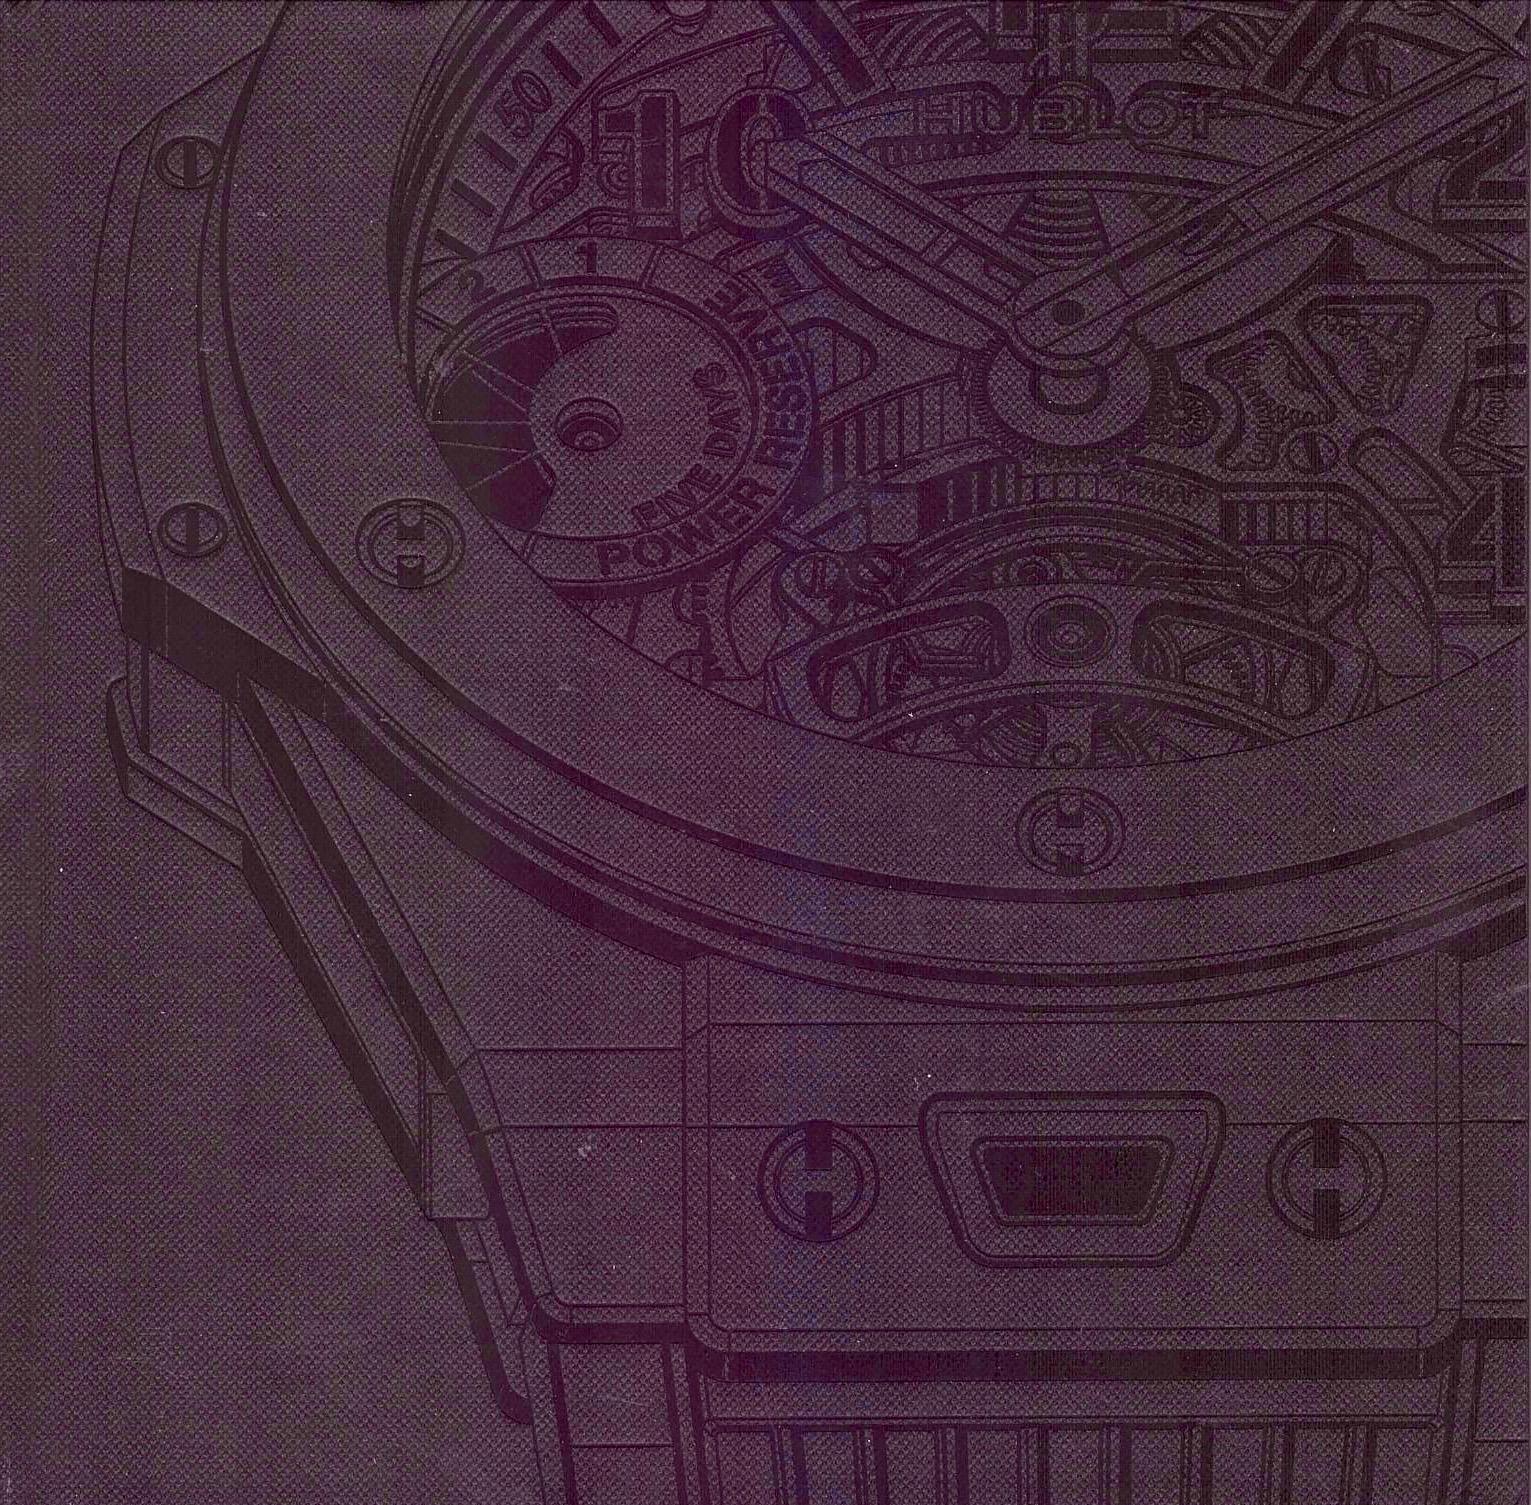 Der Hublot Katalog 2015